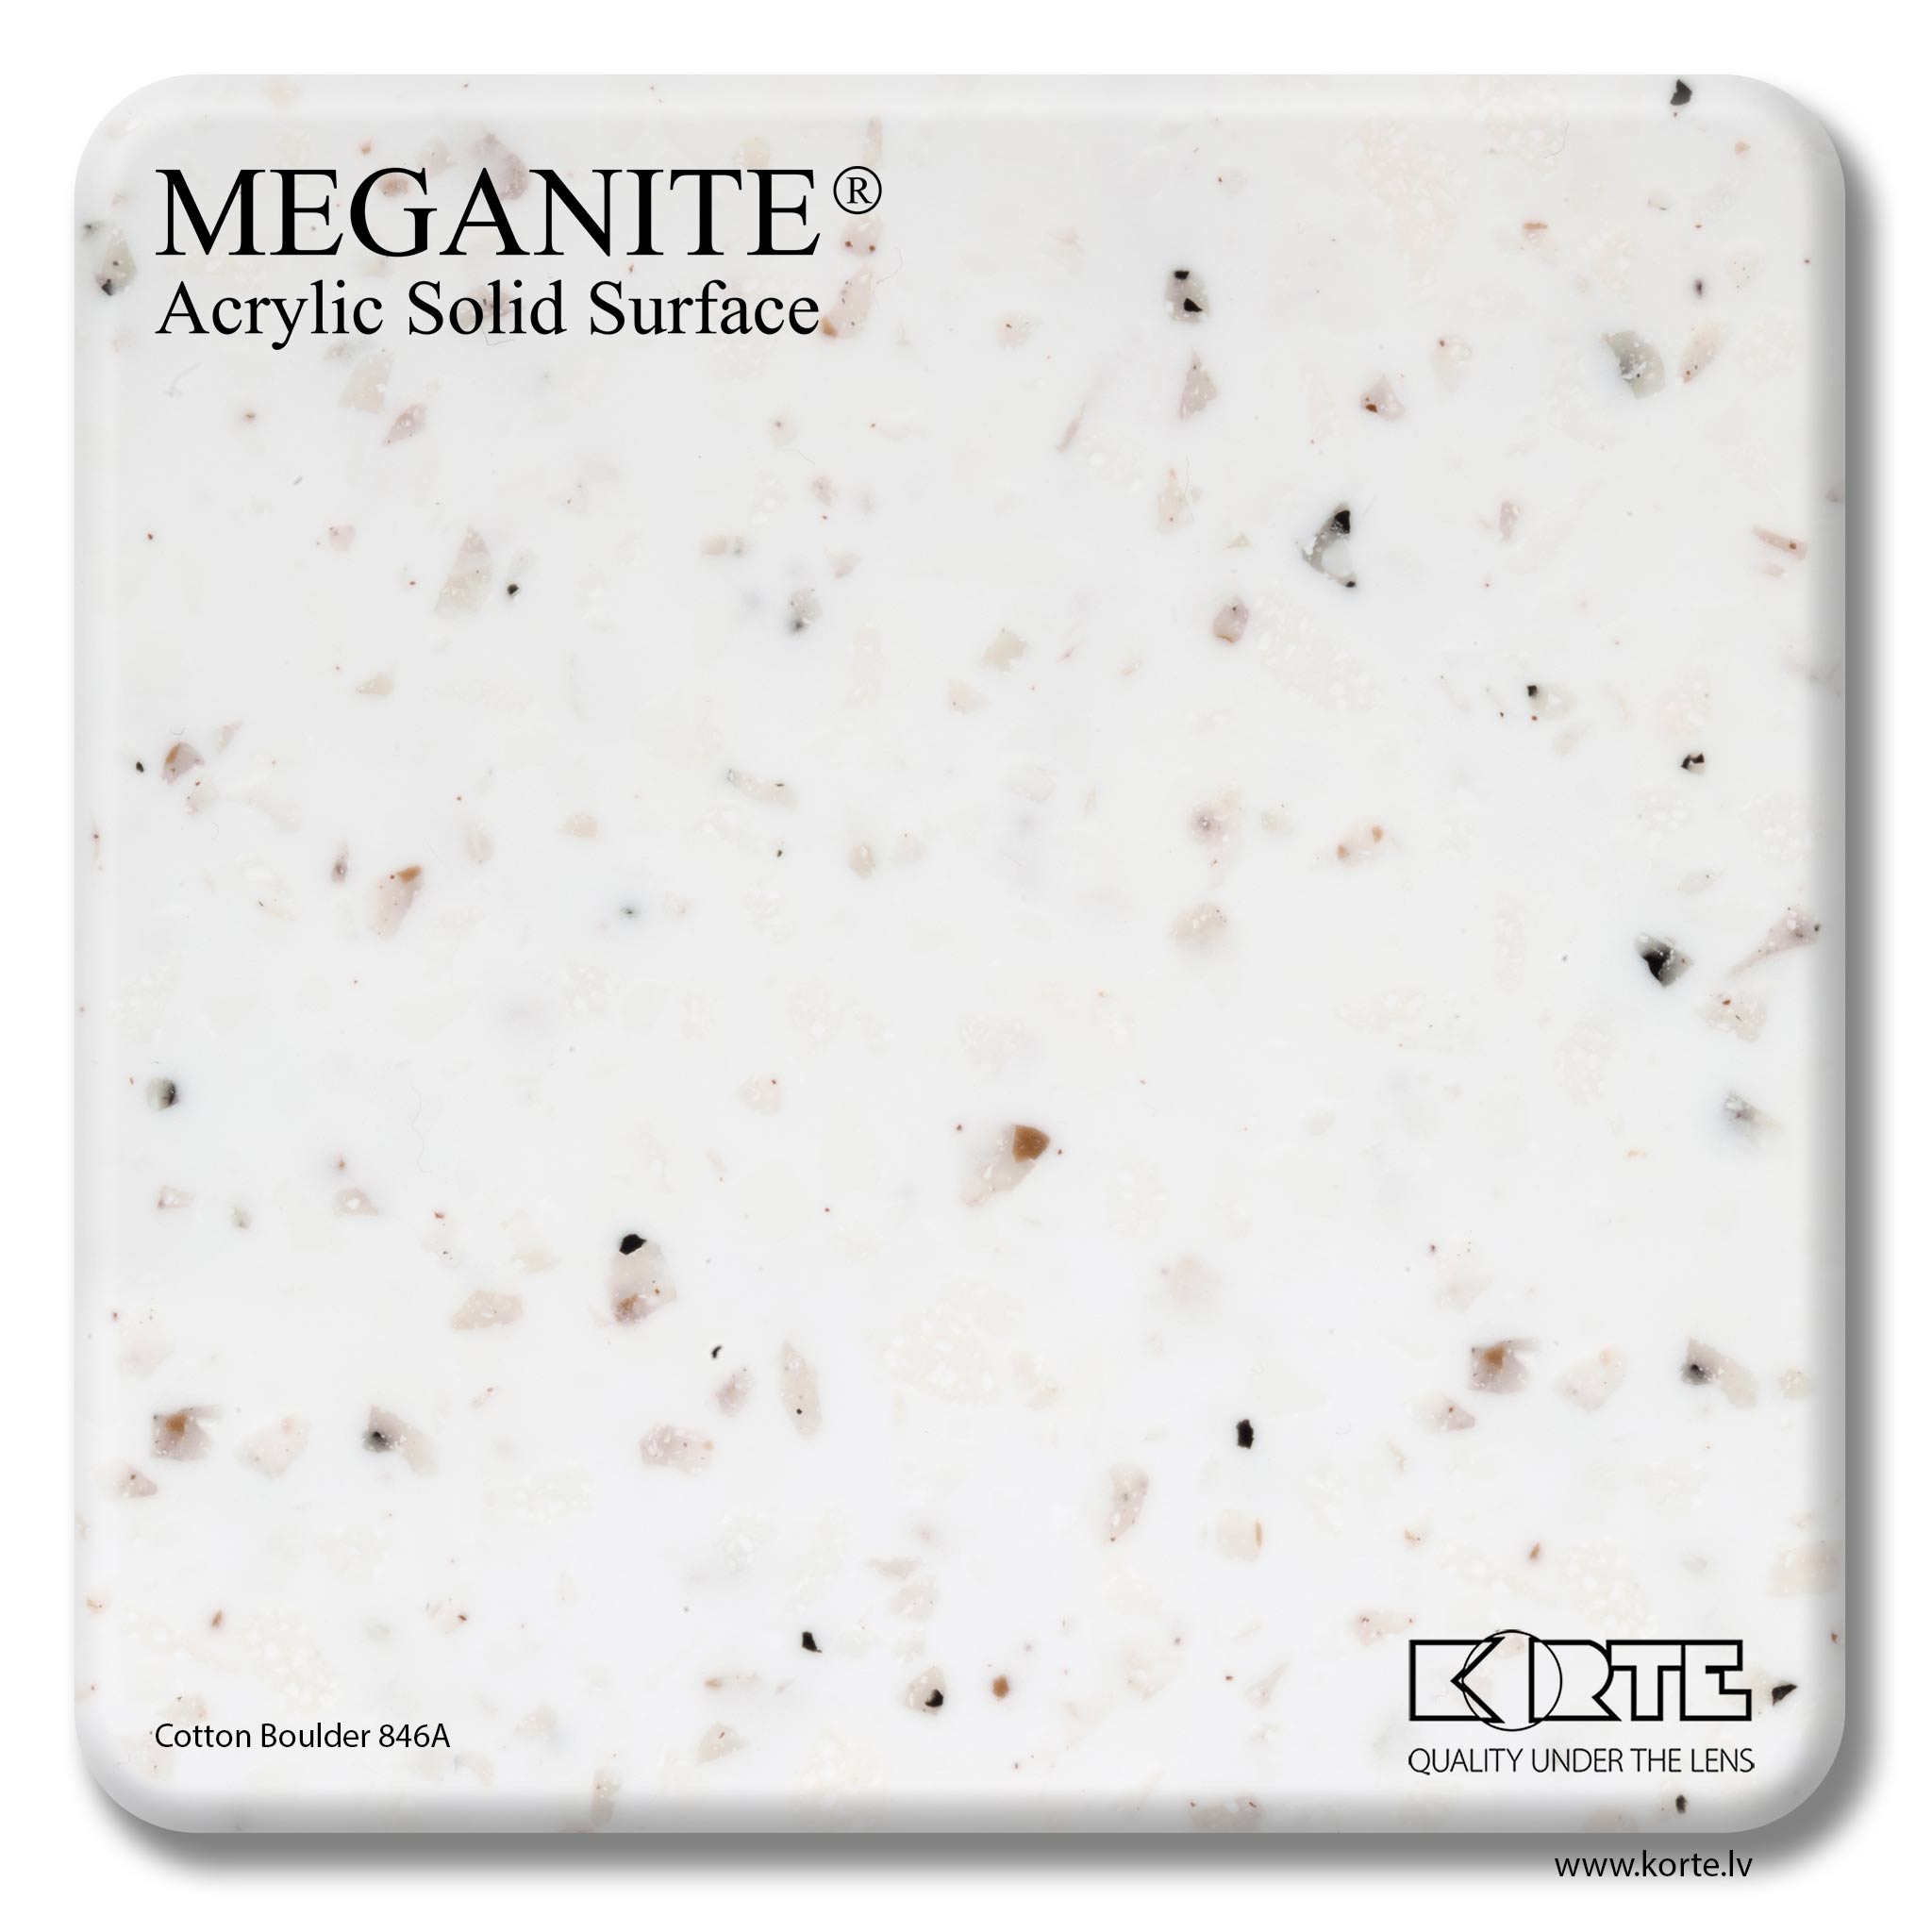 Meganite Cotton Boulder 846A